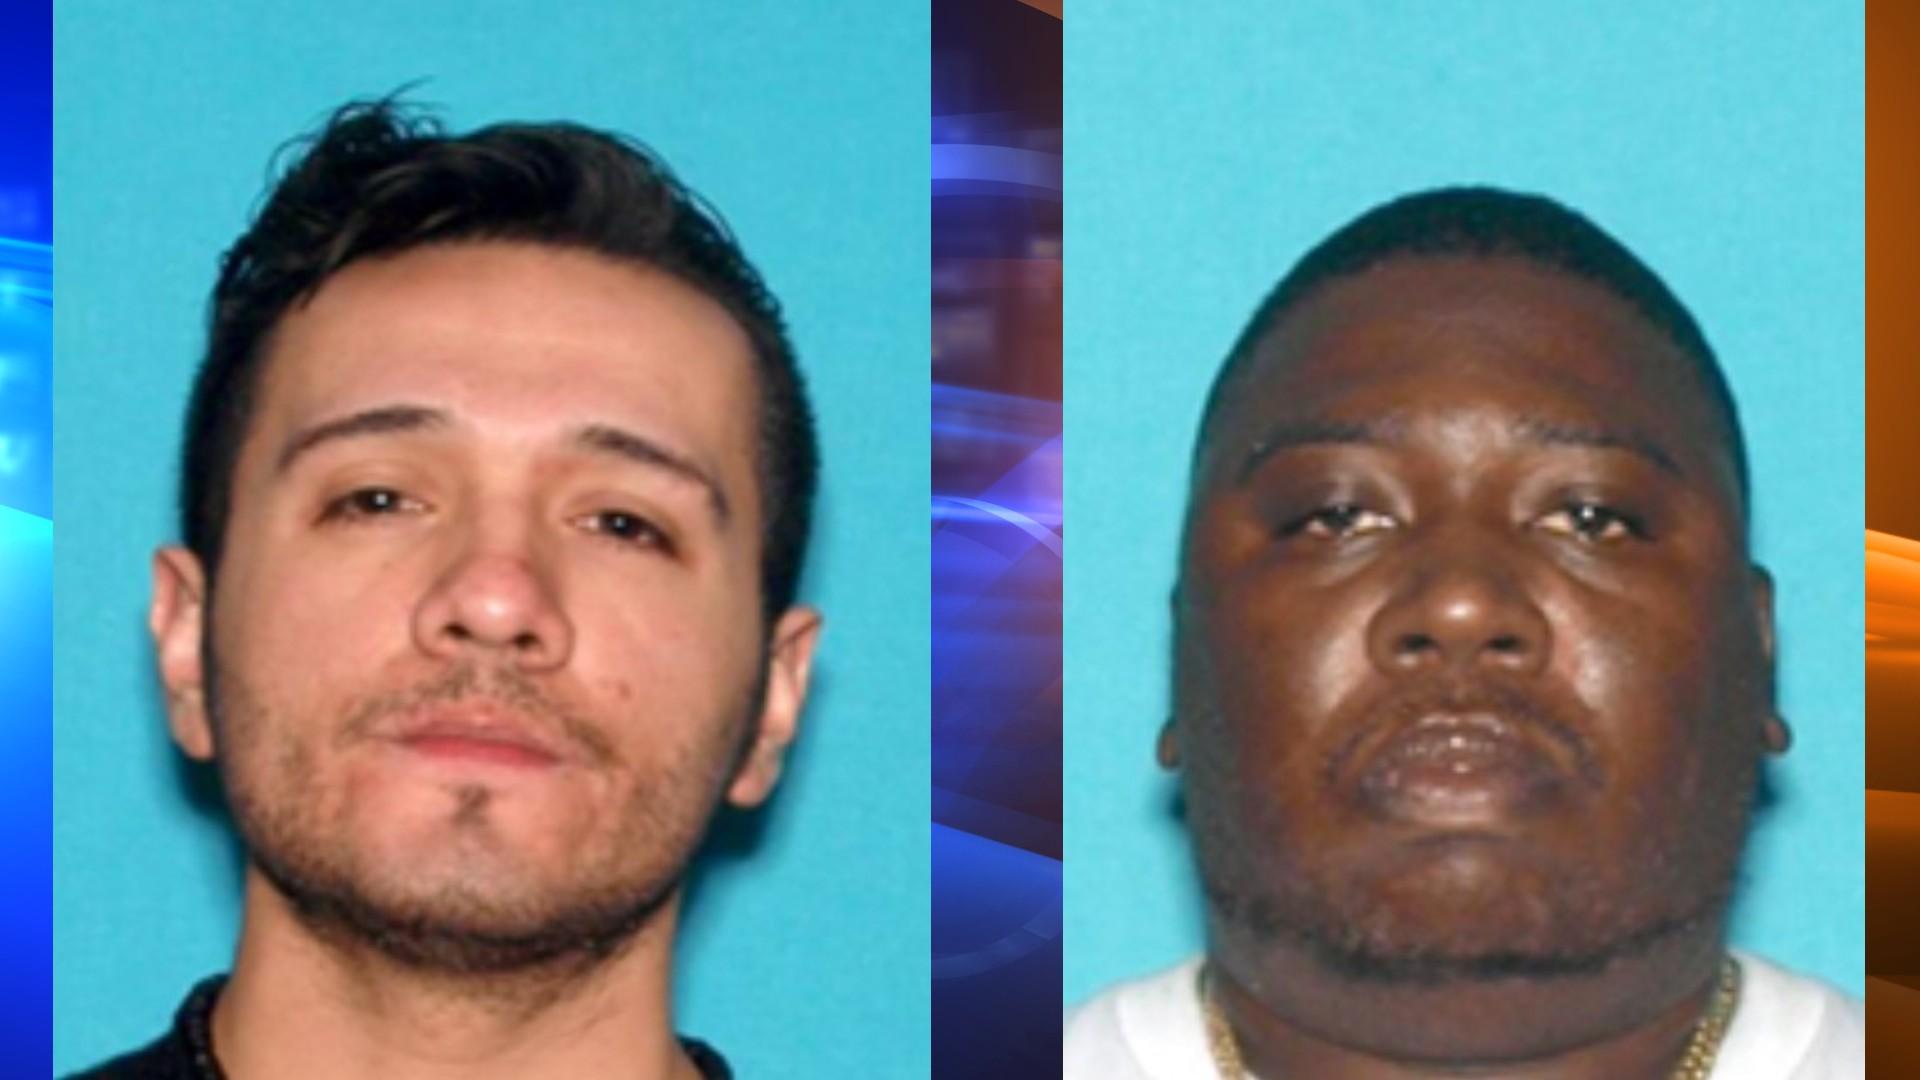 Dave Sanchez, left, and Mark Burton, right, were shot in San Bernardino in the past two days. (San Bernardino Police Department)